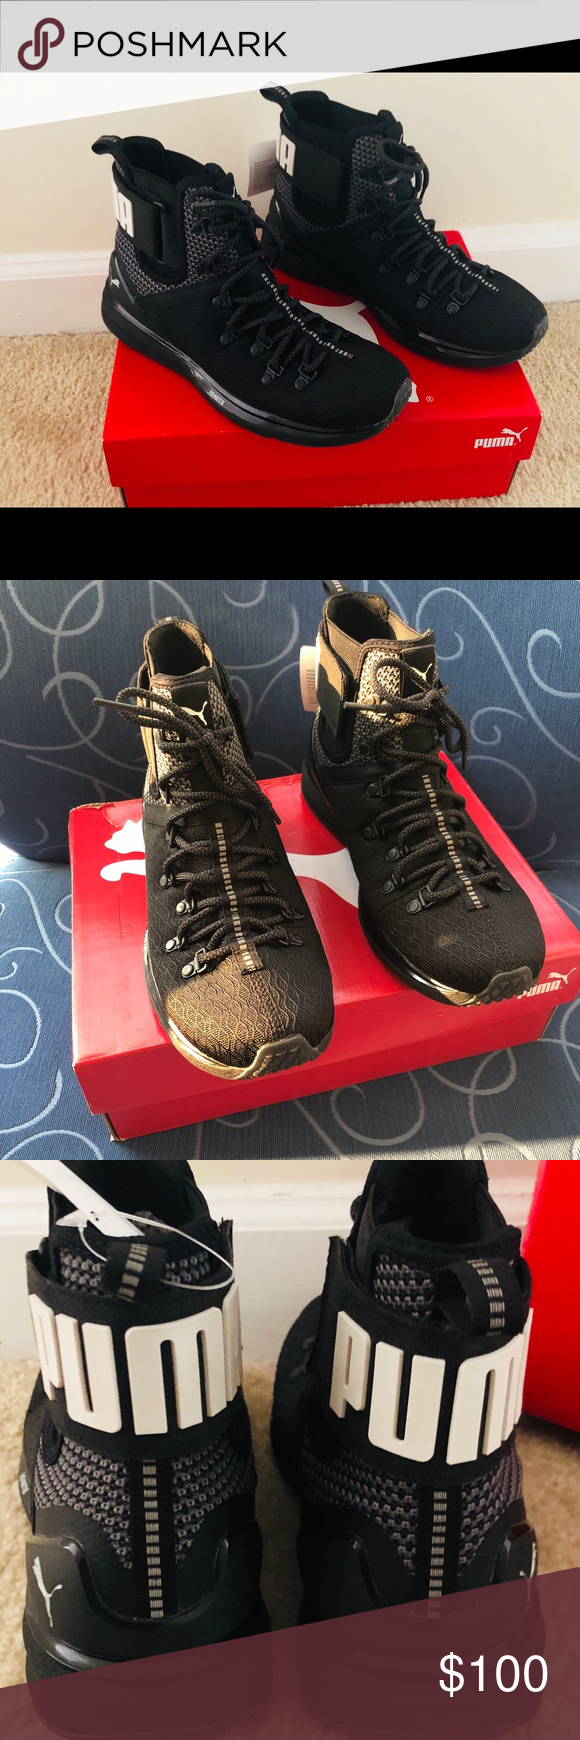 sports shoes 9023f 7b30d NEW PUMA LIMITLESS IGNITE Boot Men's 7.5 NEW IN BOX ...